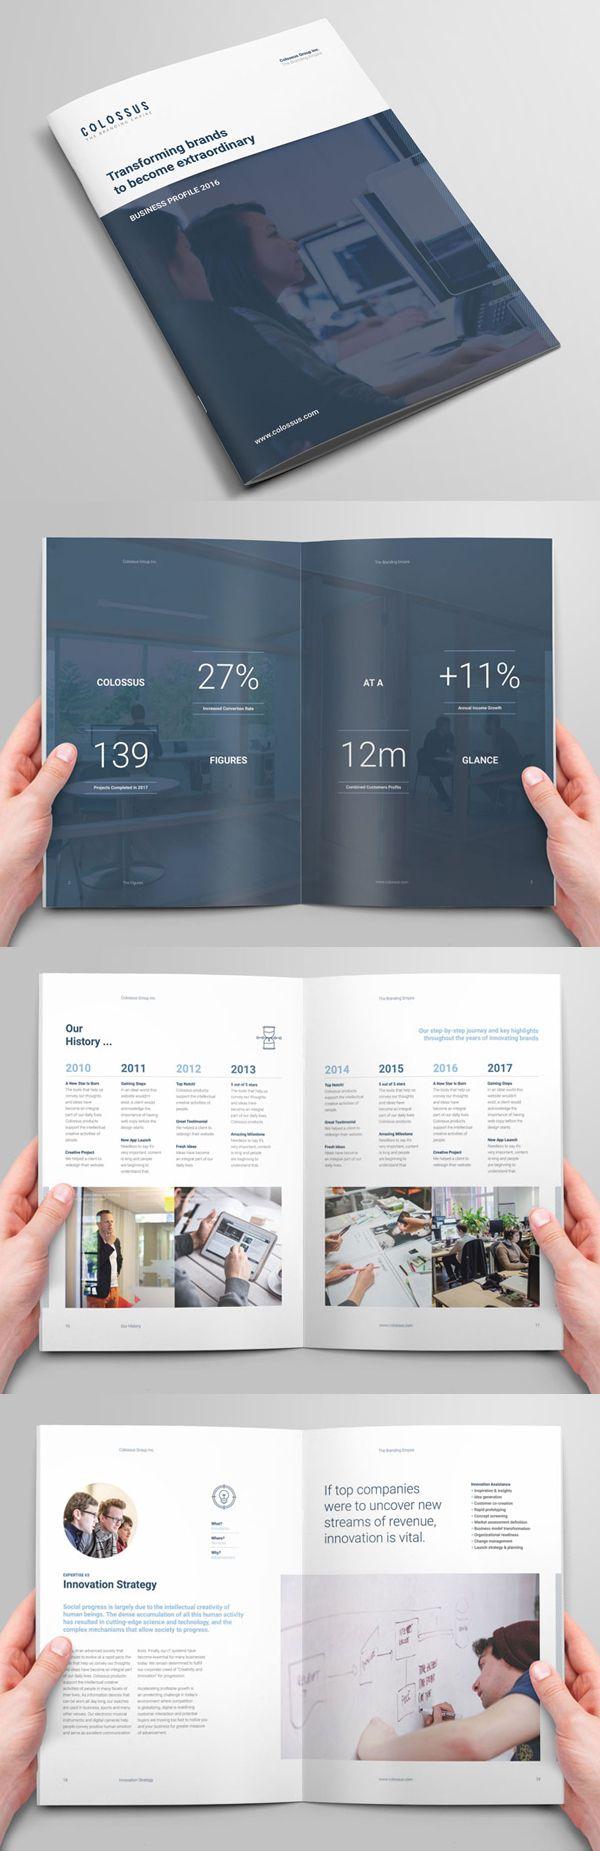 Corporate Profile Brochure | 排版&摆拍 | Pinterest | Diseño ...